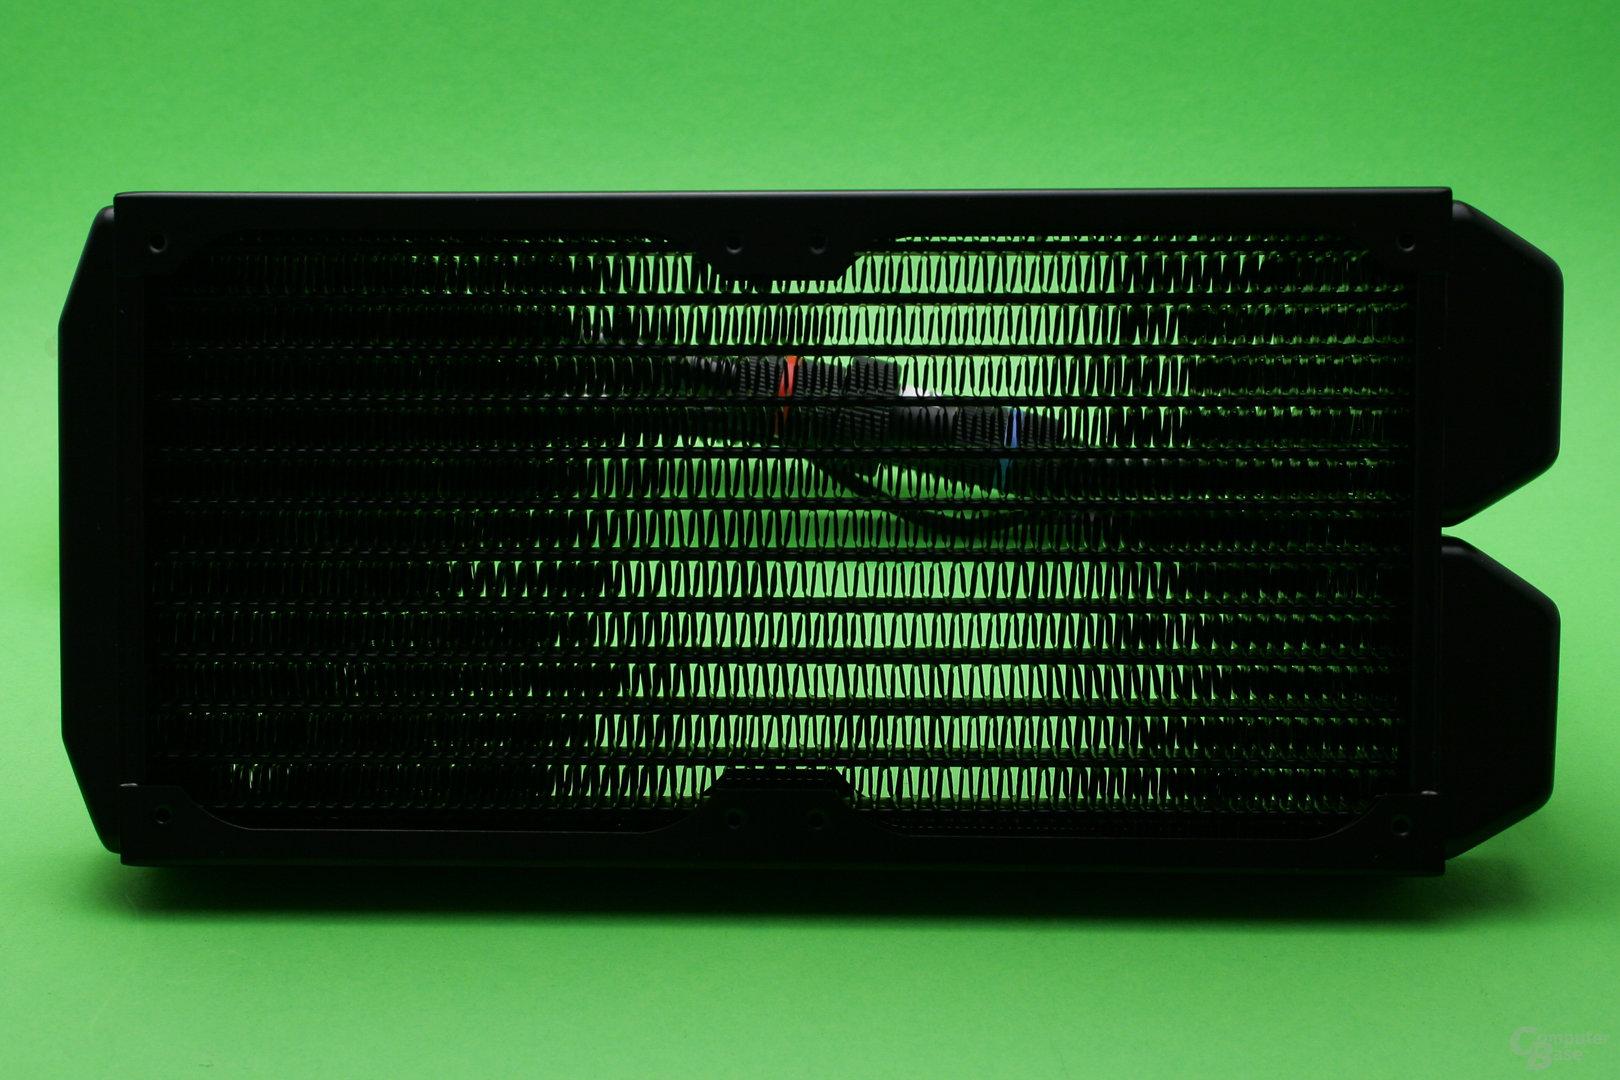 Alphacool Eisbaer: NexXxos ST30 240 Radiator